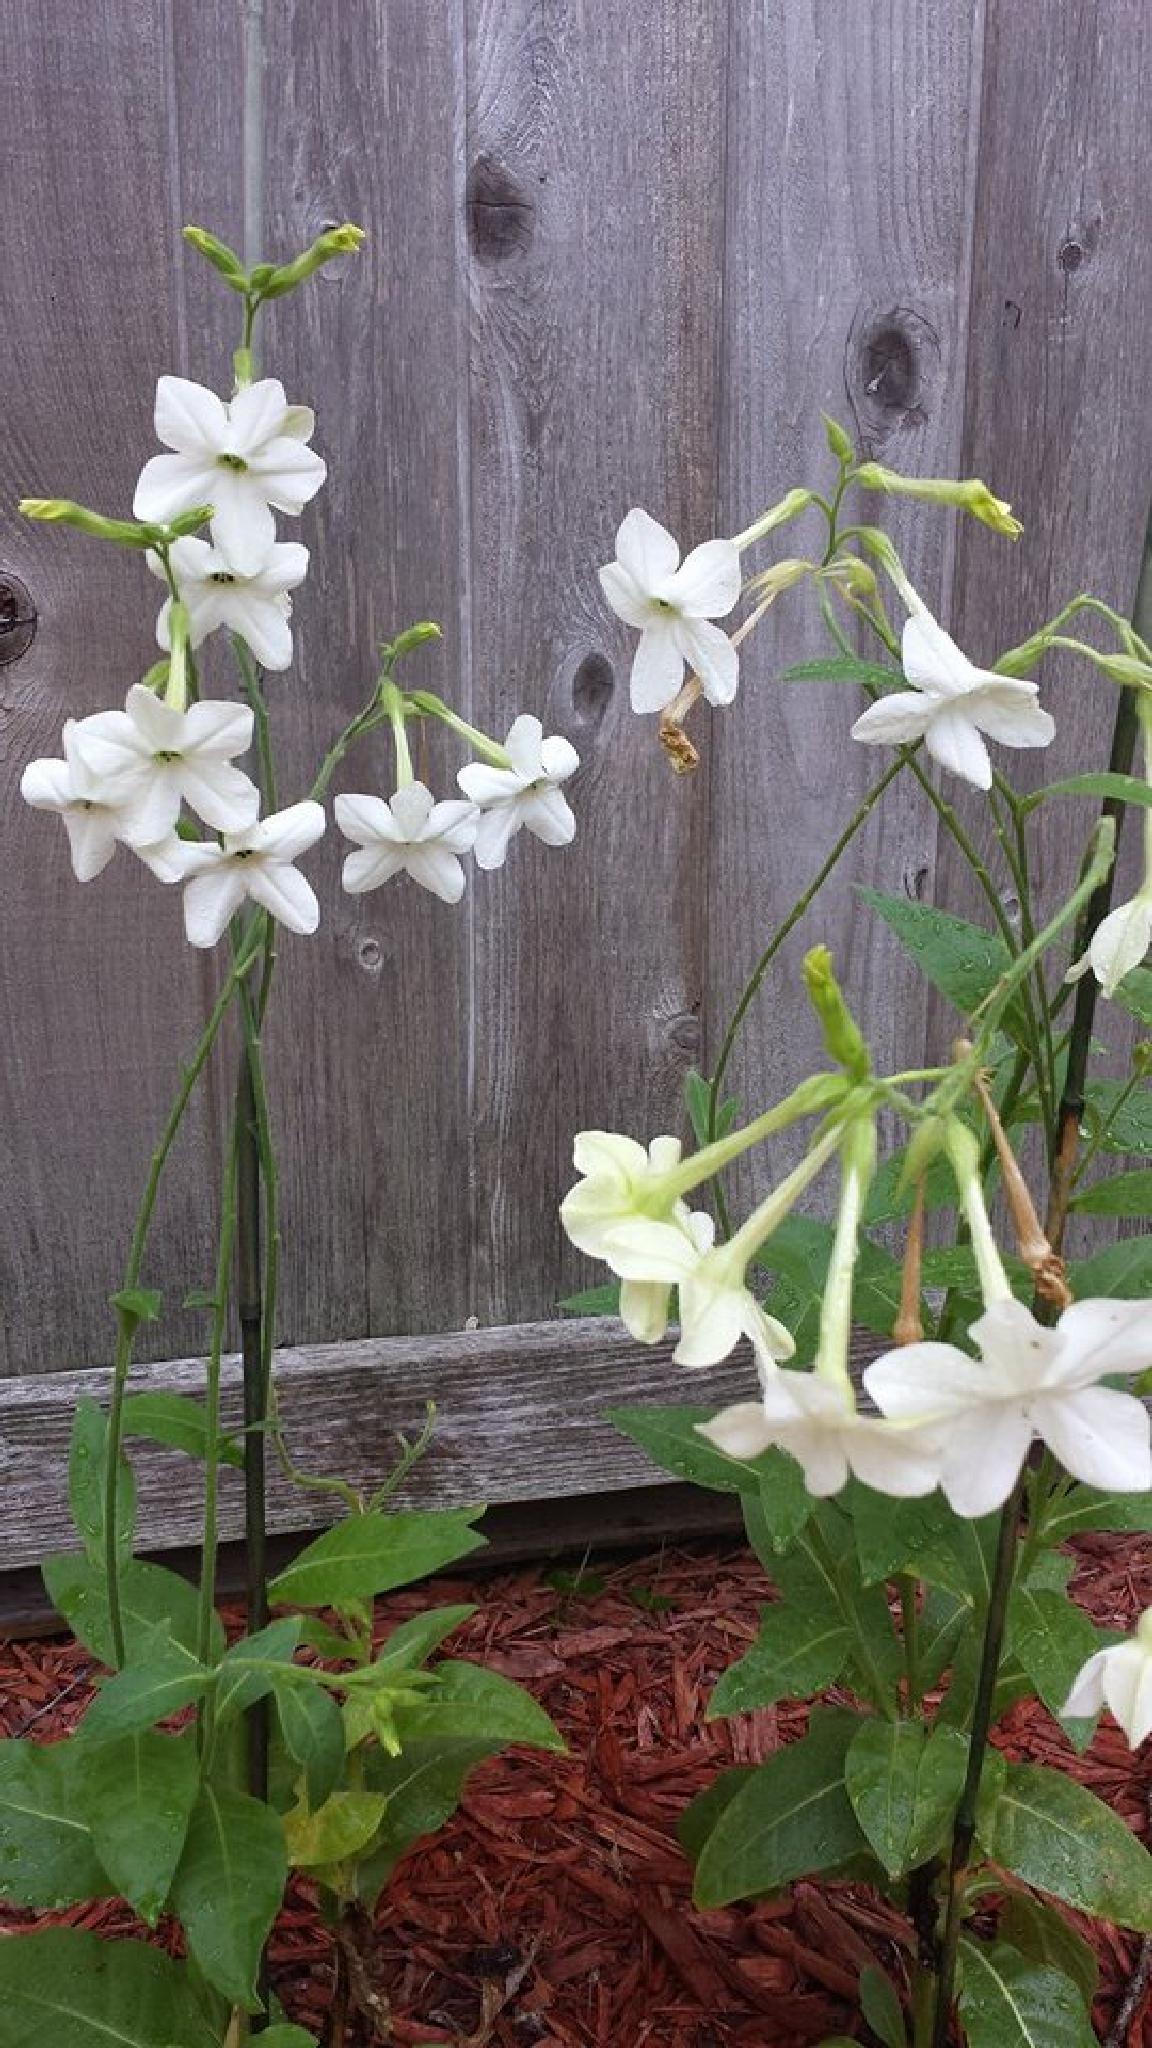 White Blooms Nicotiana Alata by mimi.difrancesca